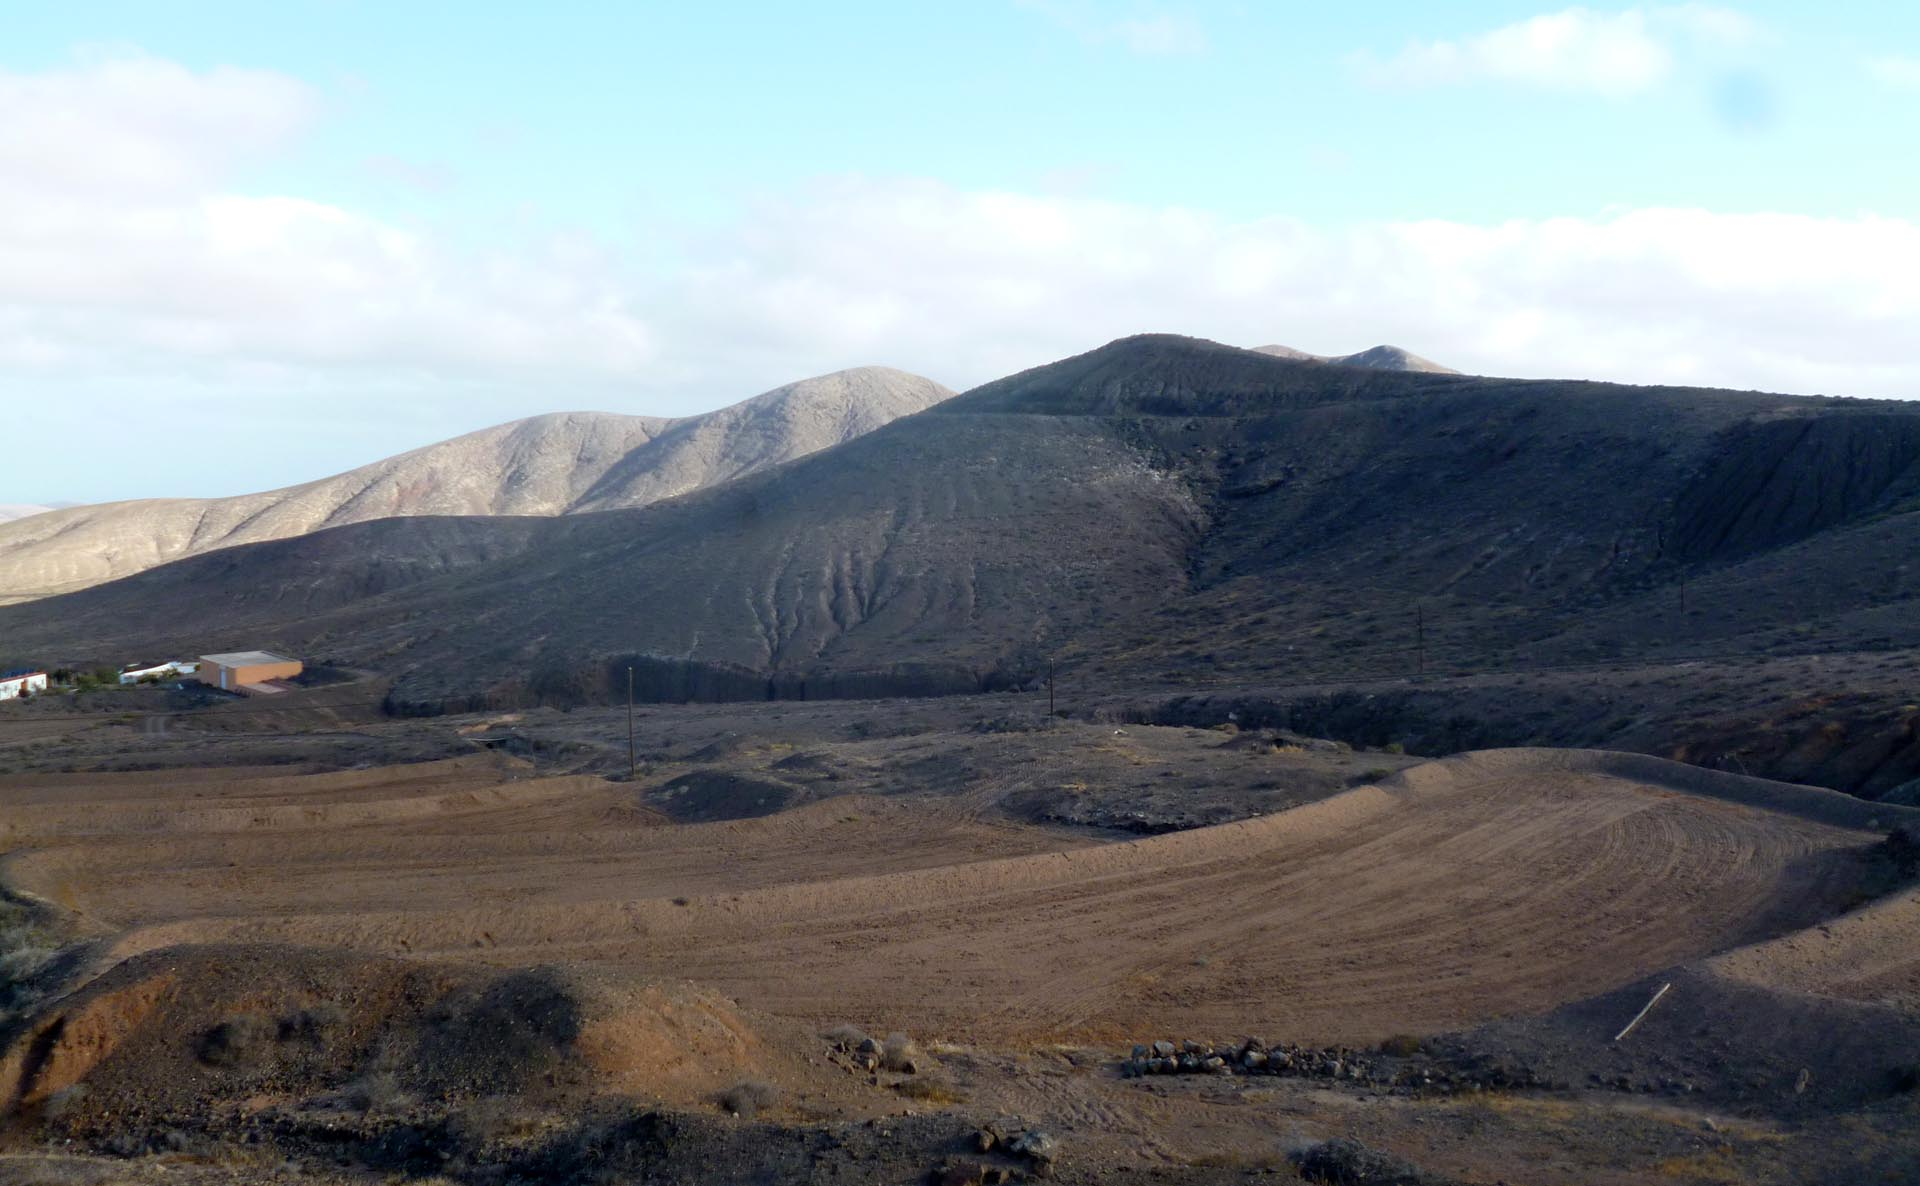 Viaggio a Fuerteventura panorama alle isole Canarie